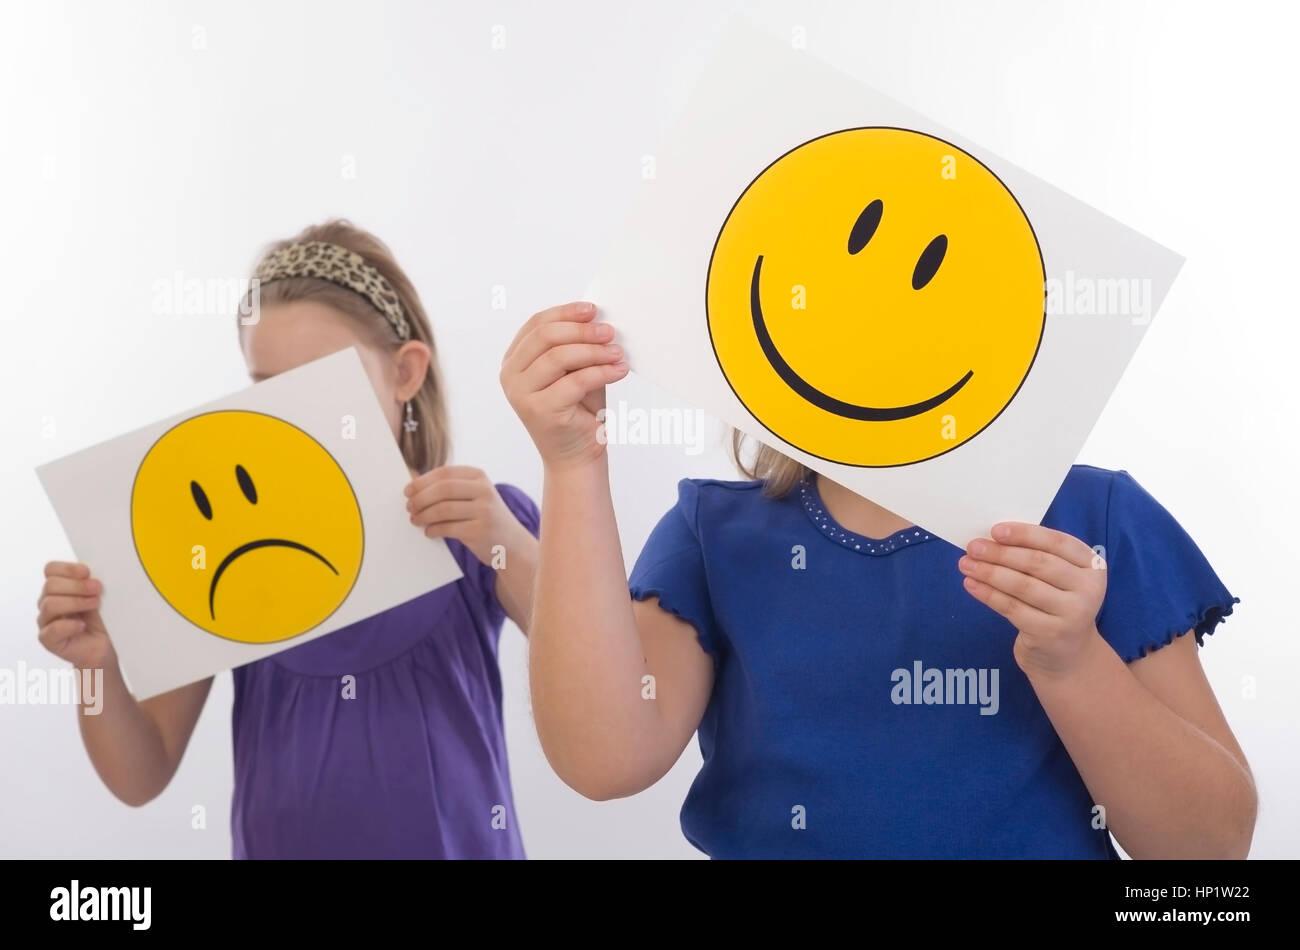 Model release , Trauriges und froehliches Kind, Symbolbild - sad an happy children, symbolic - Stock Image